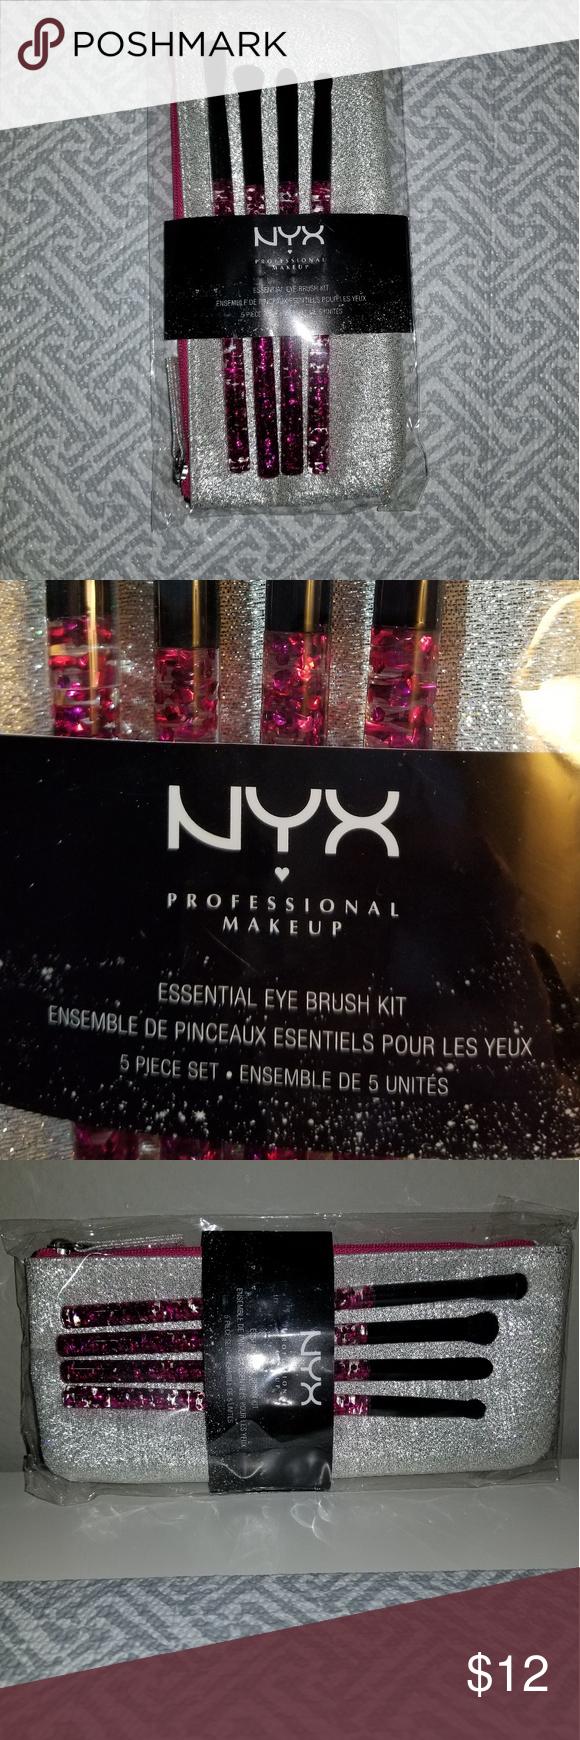 Nyx eye brush kit Eye brushes, Brush kit, Makeup tools